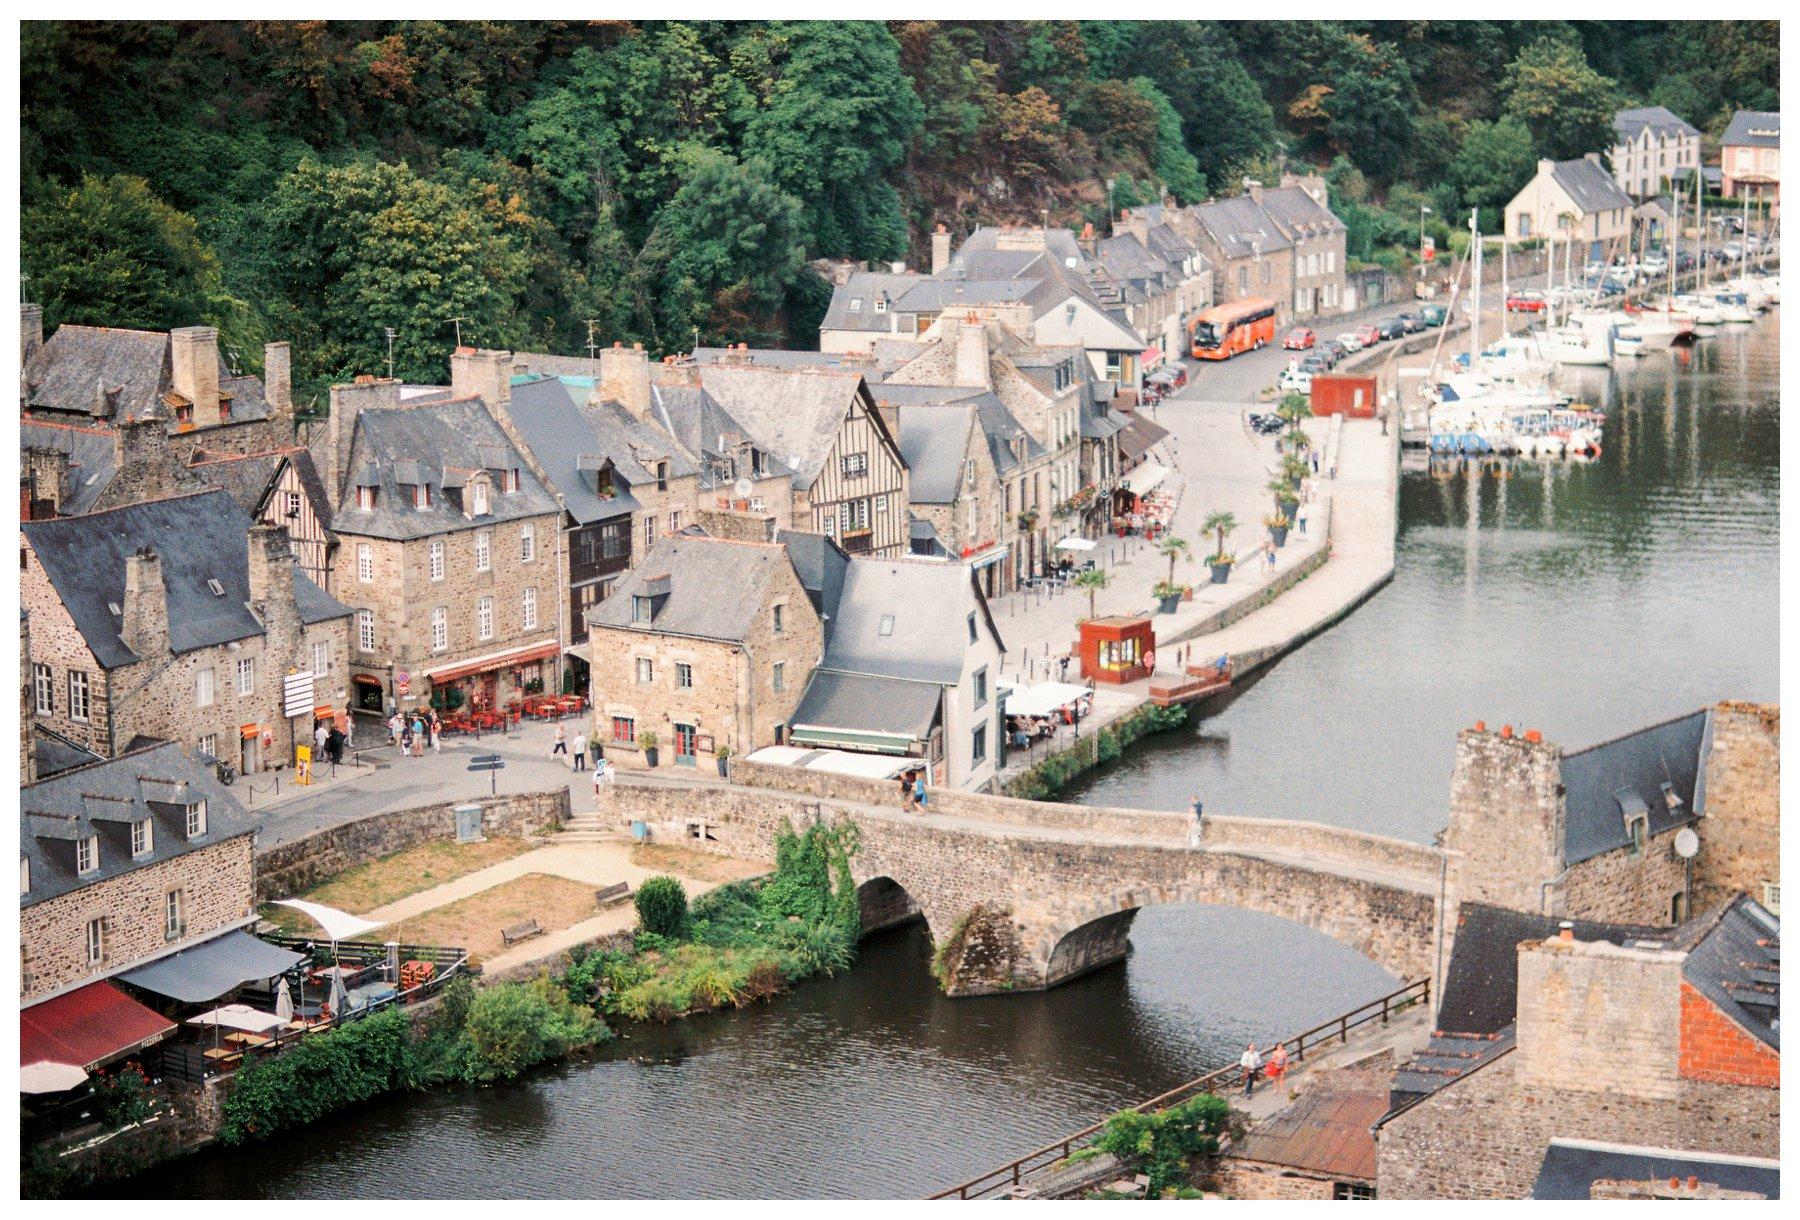 medieval Dinan, France